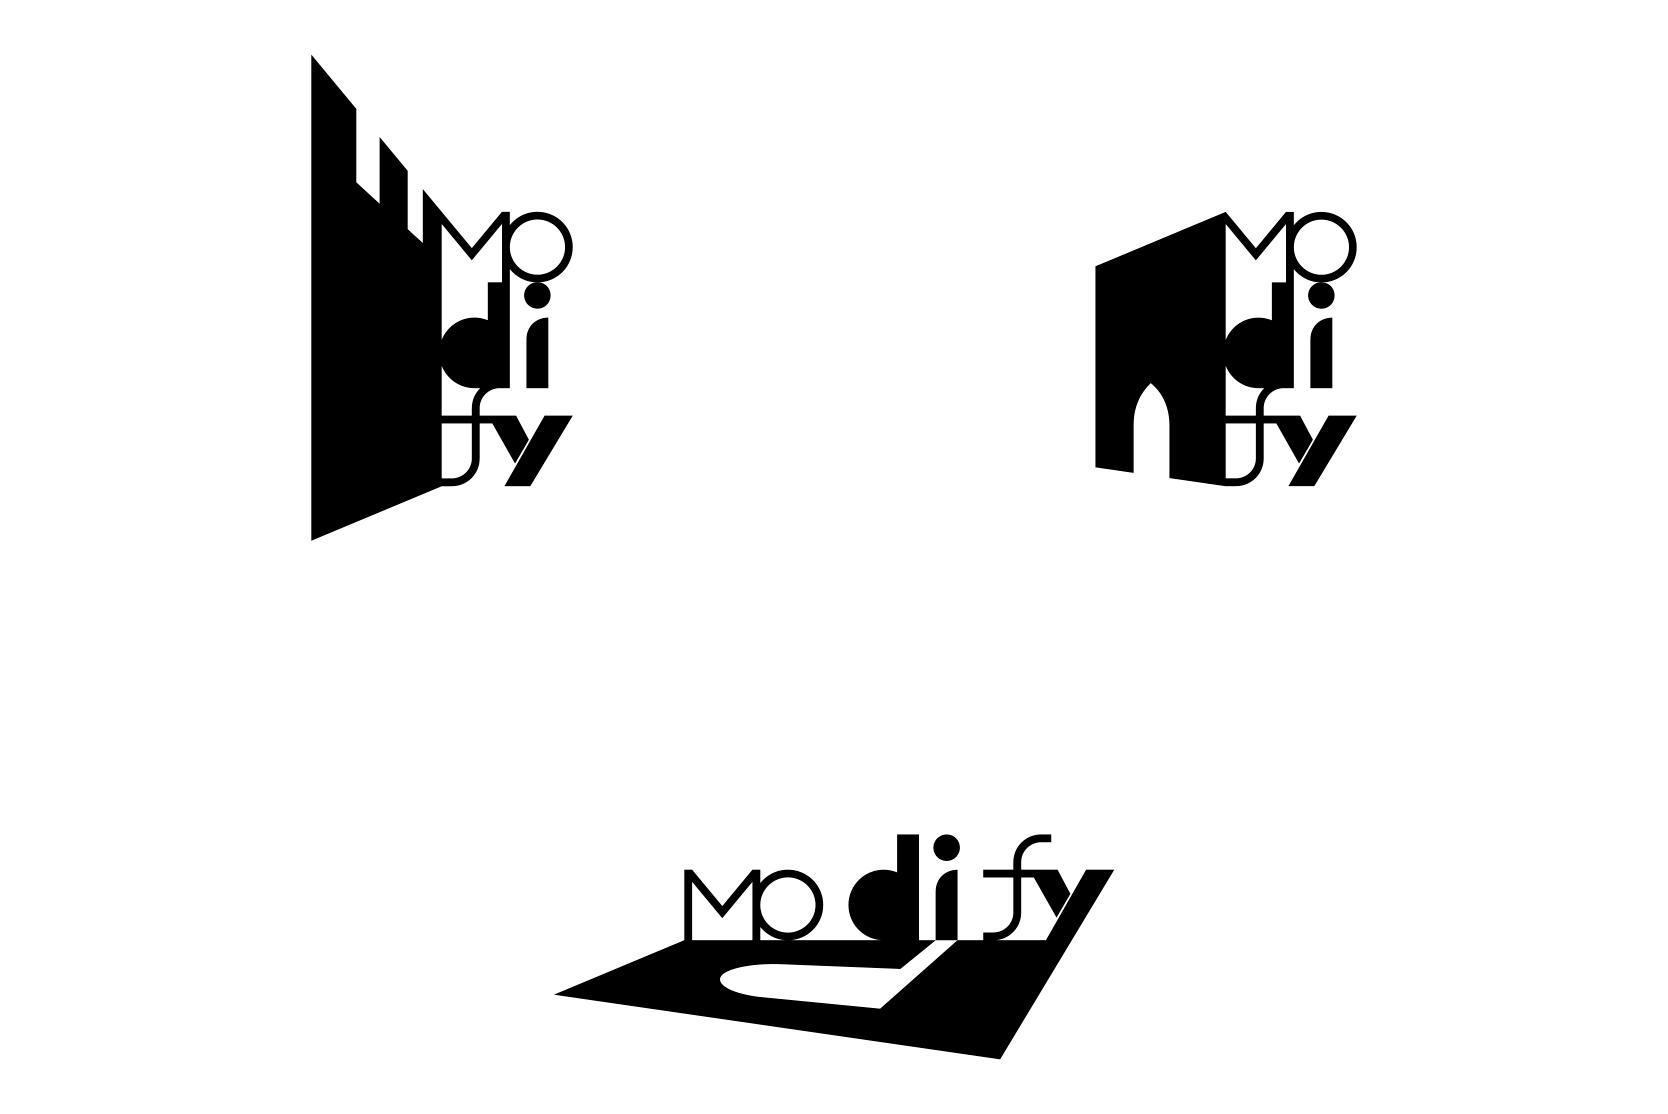 Modify: Logos